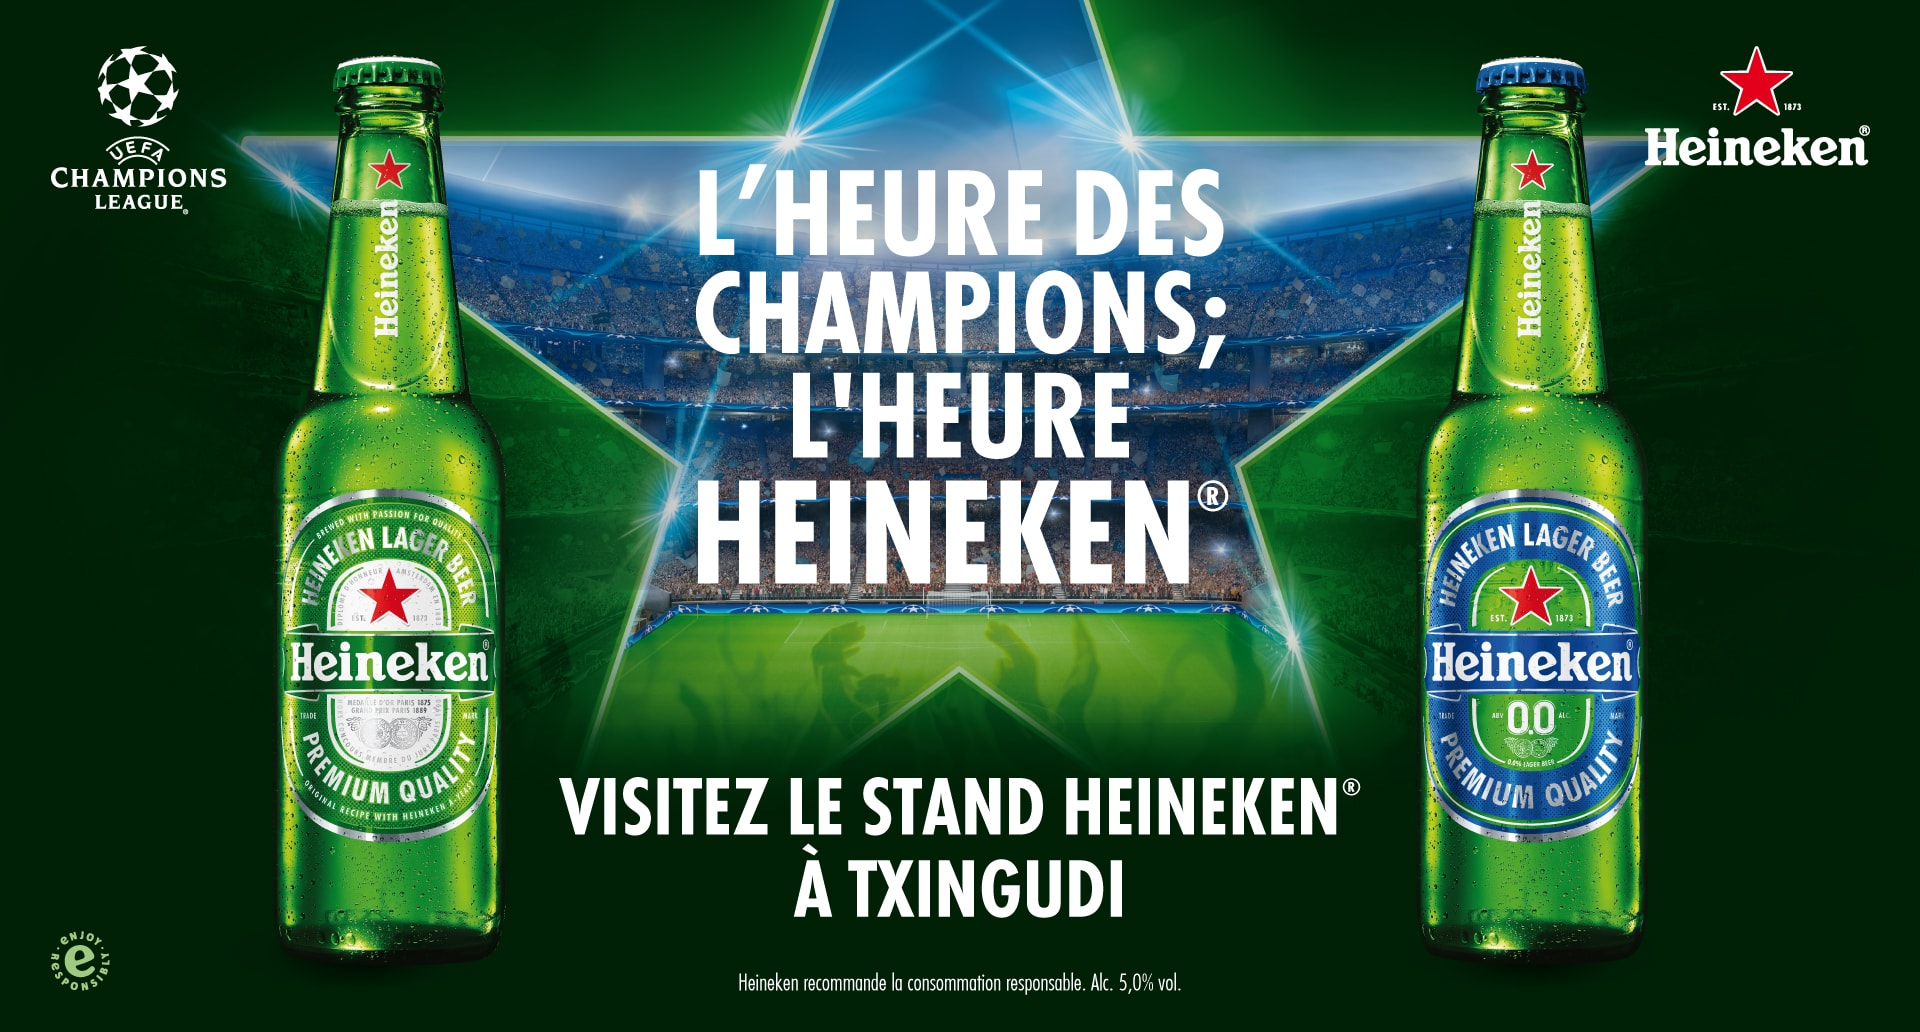 L'heure des Champions; l'heure Heineken